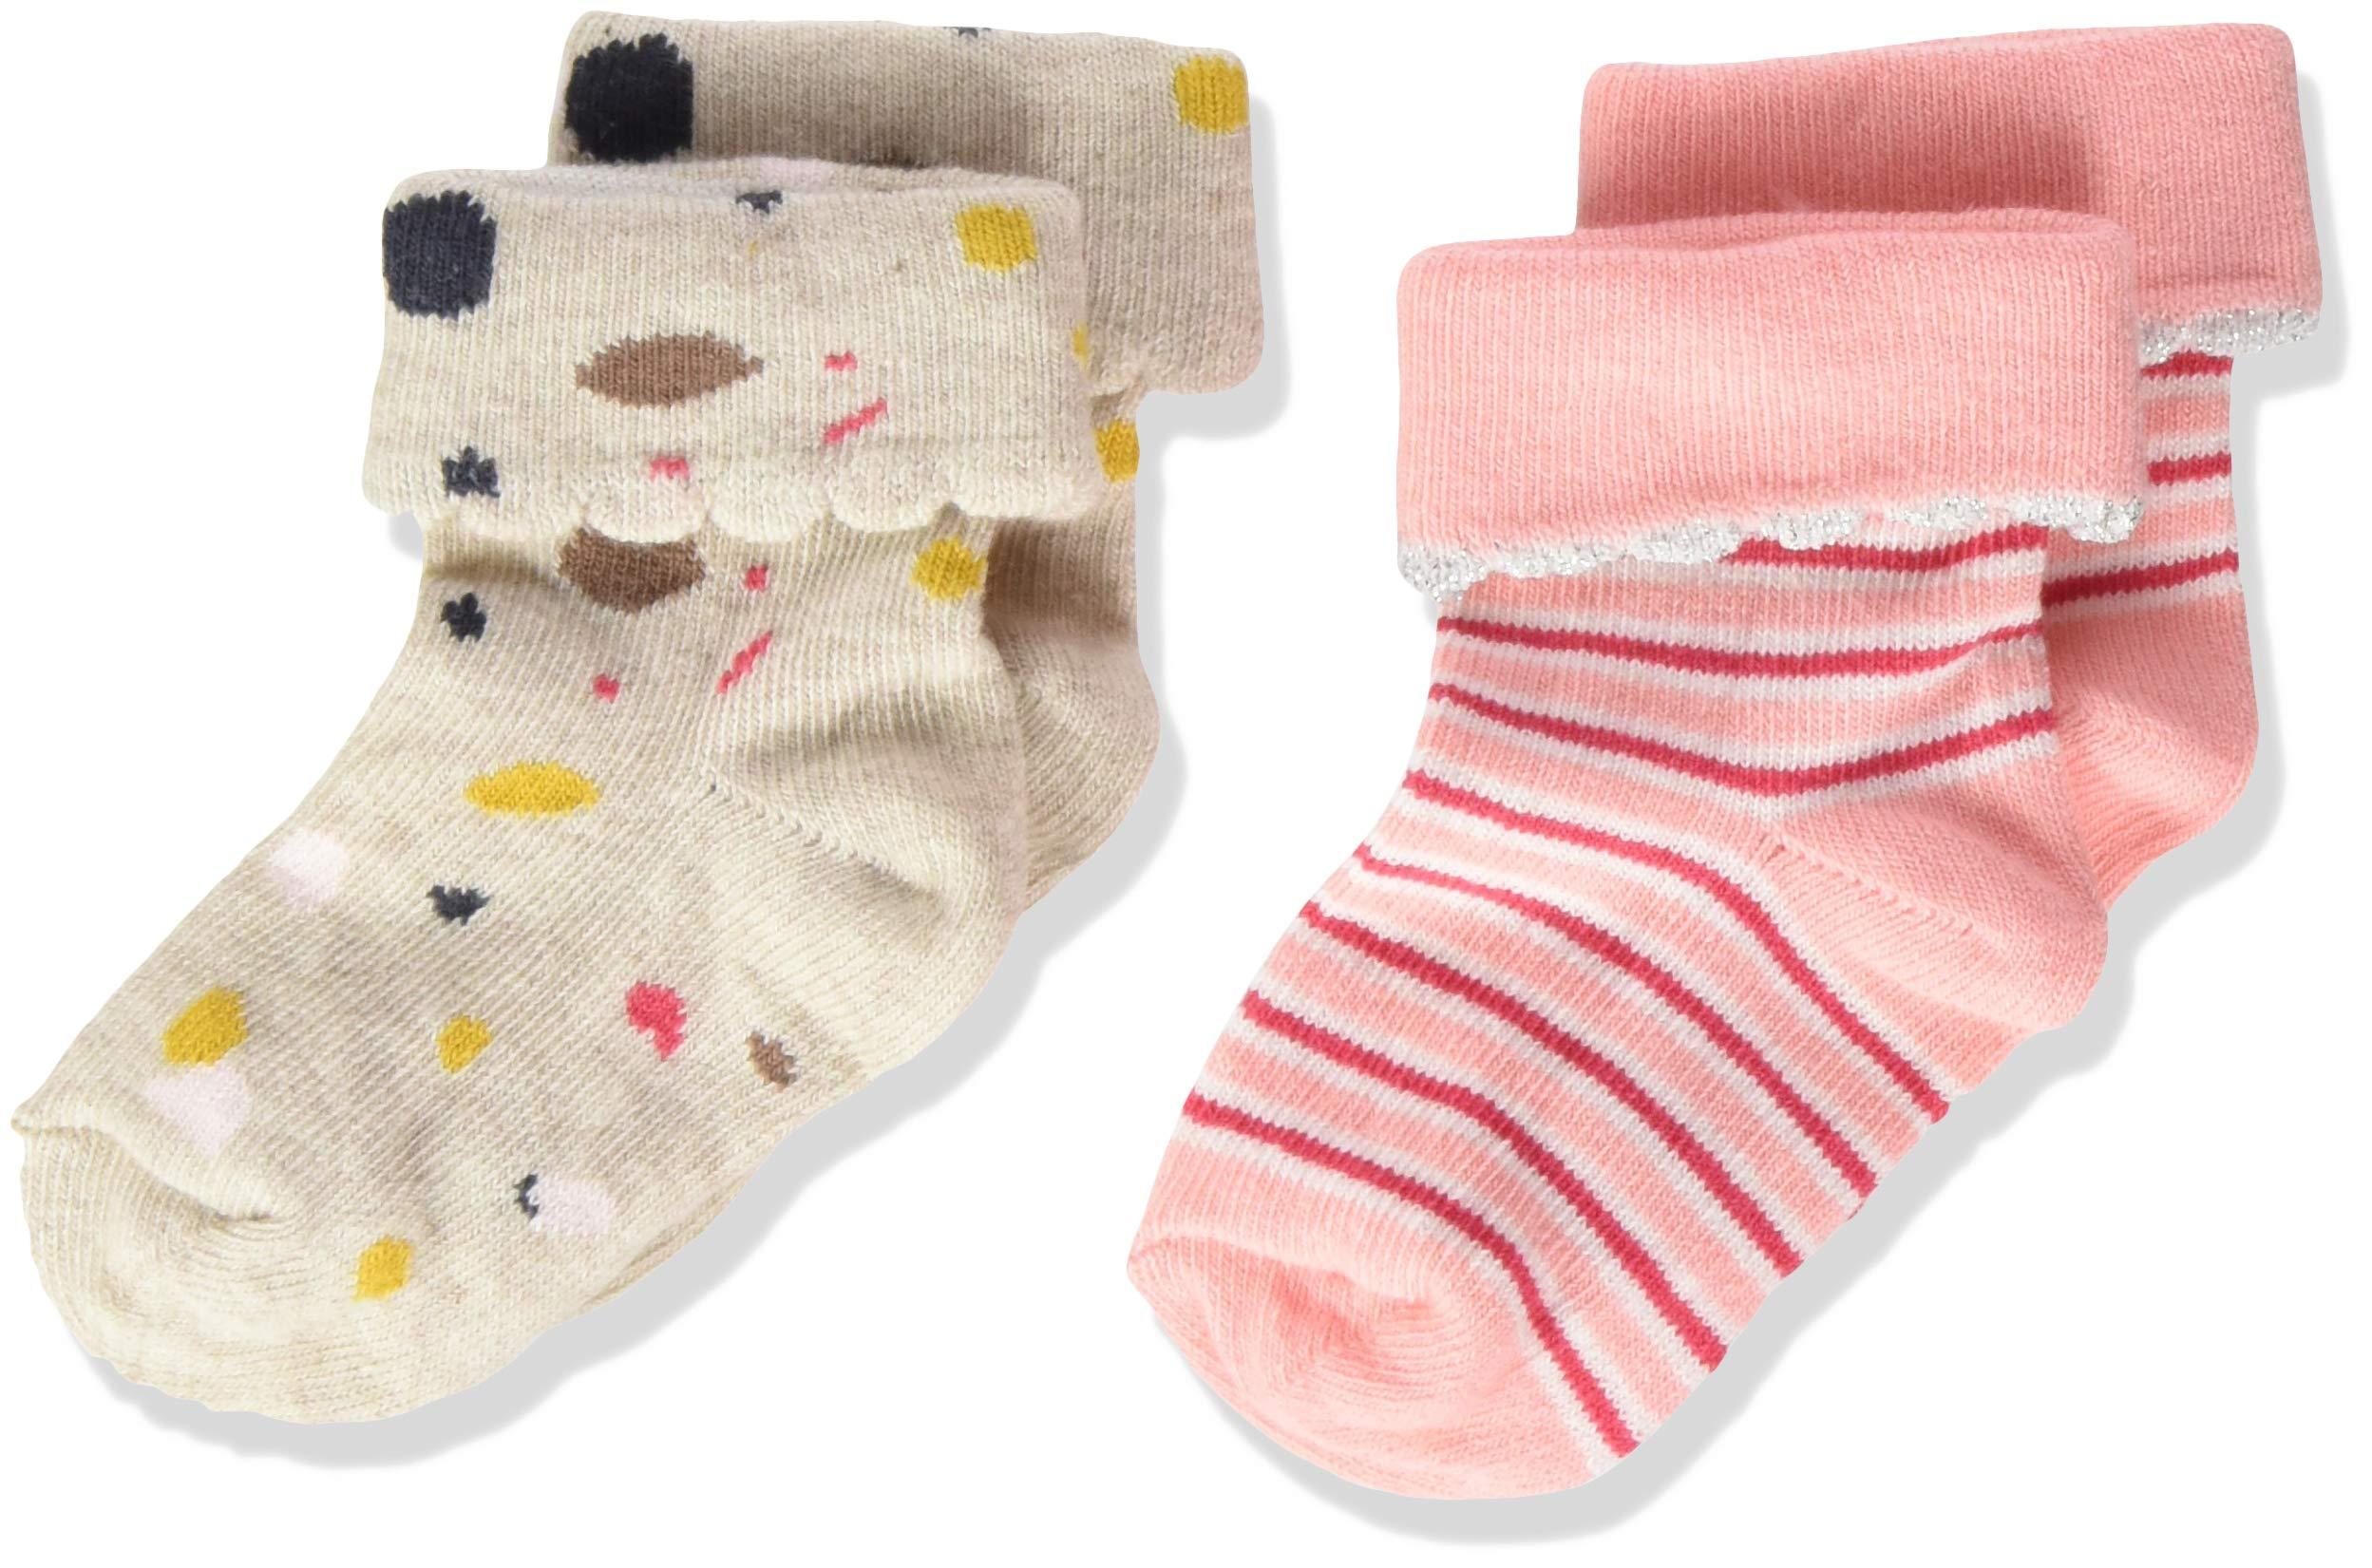 Noppies G Socks ANN Arbor Calcetines para Bebés 1